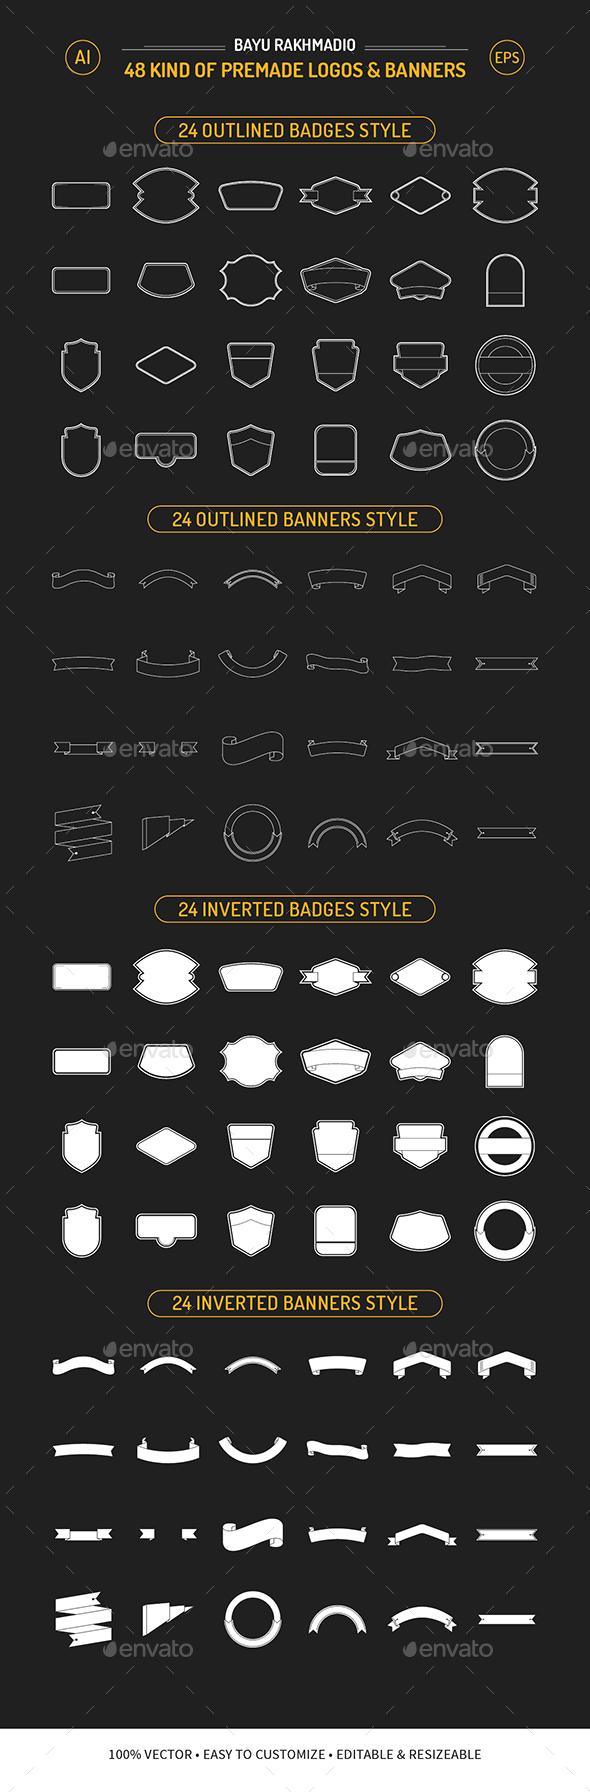 GraphicRiver 48 Kind of Premade Logo & Banner 20677832